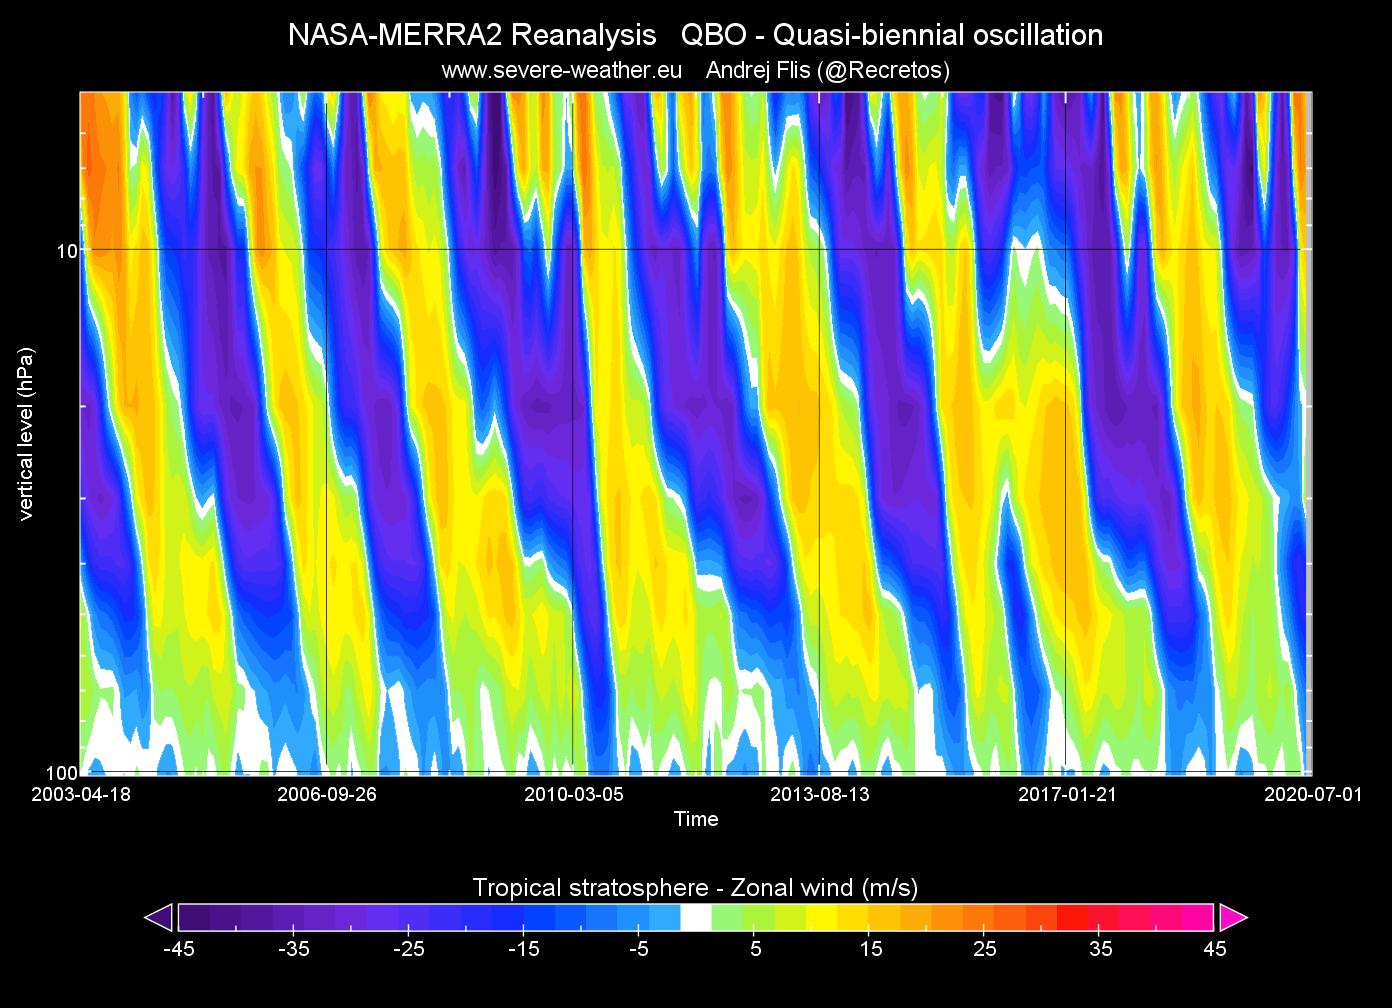 polar-vortex-winter-qbo-history-vertical-analysis